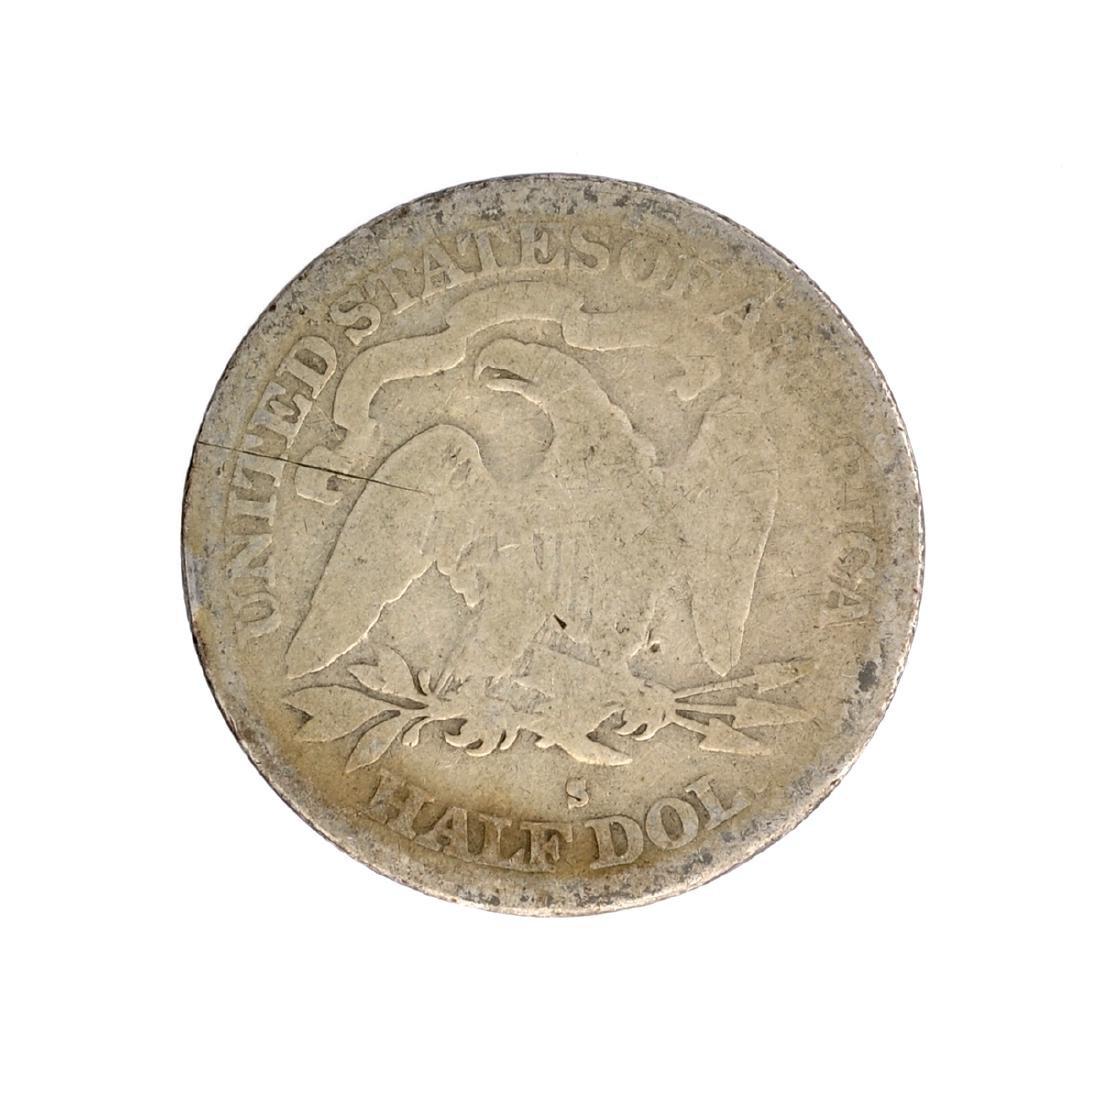 1872-S Liberty Seated Half Dollar Coin - 2